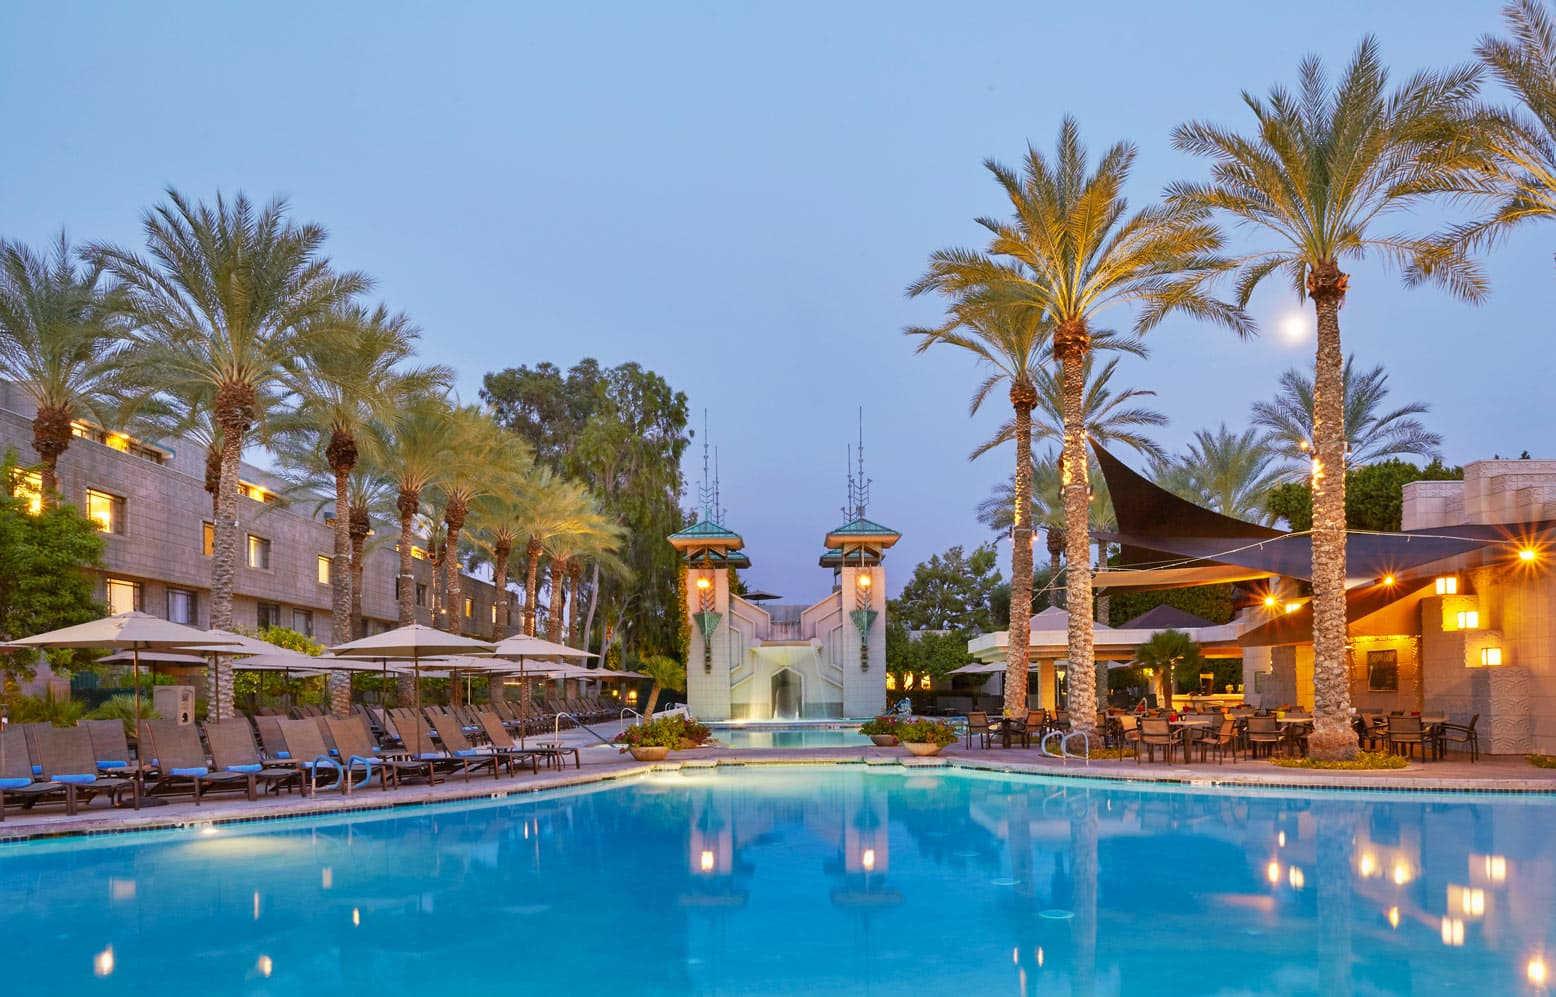 Here To See Picture Of Arizona Biltmore Pool